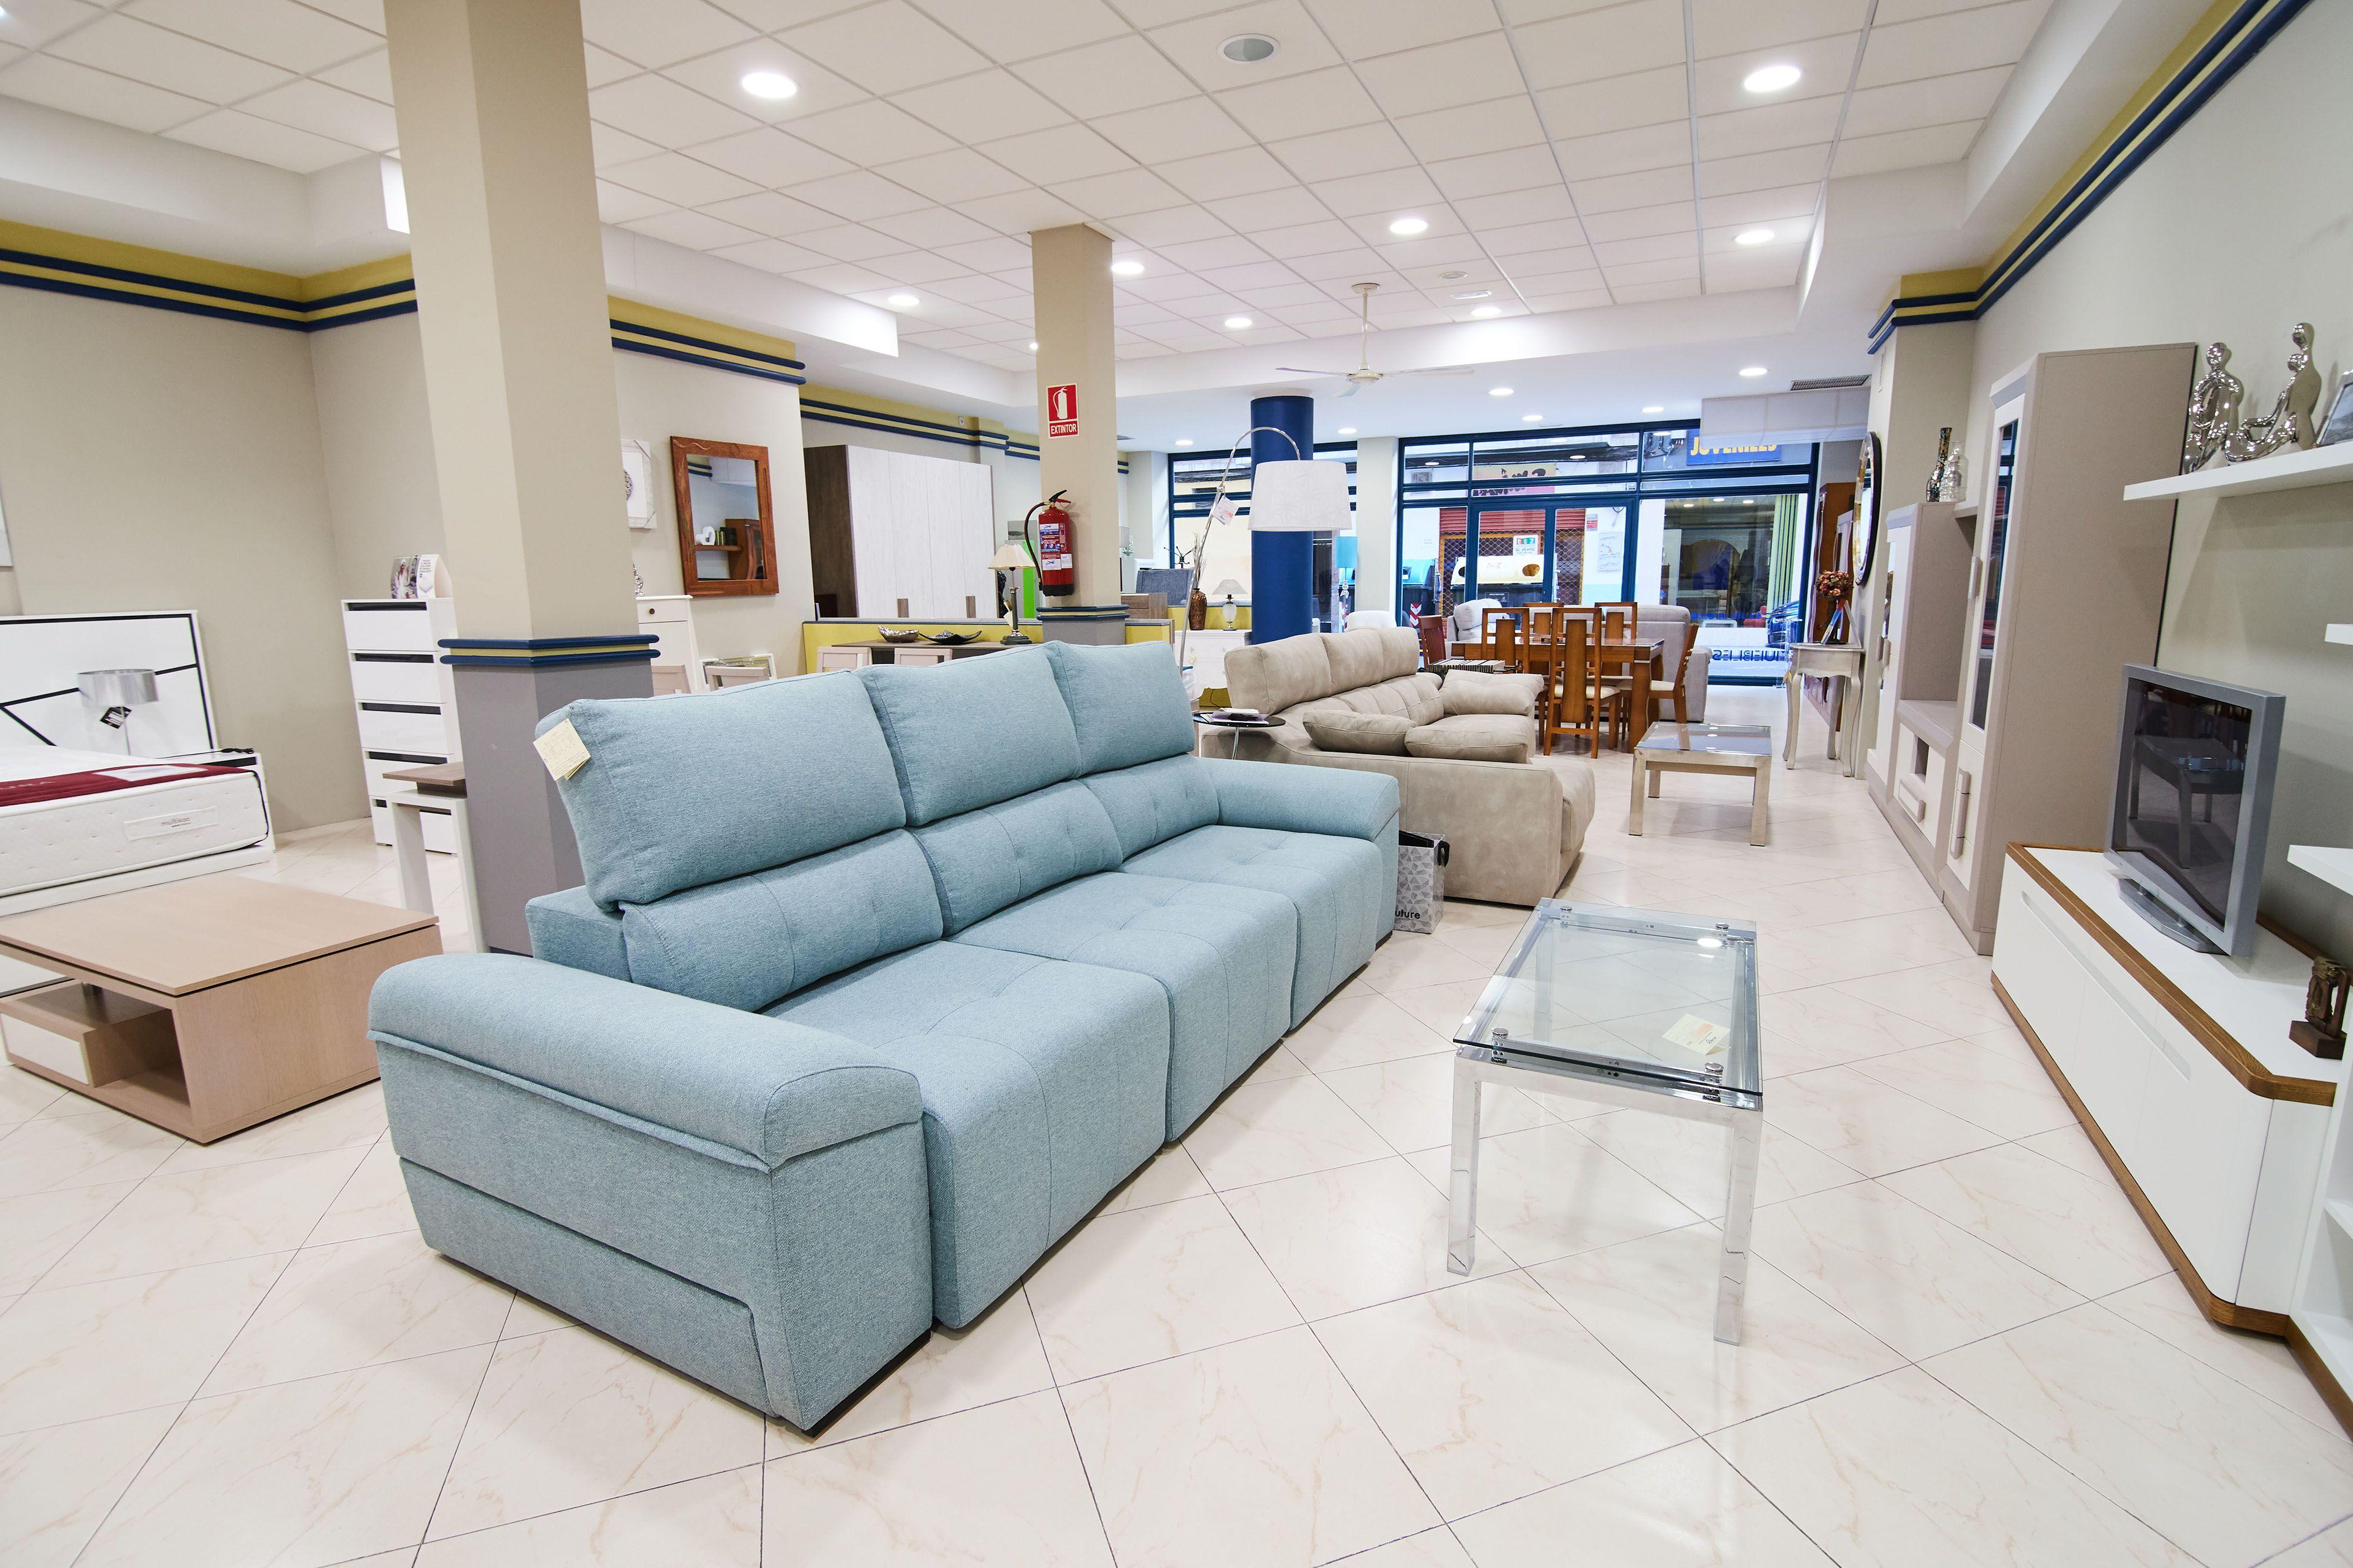 Zona salones Muebles El Pilar